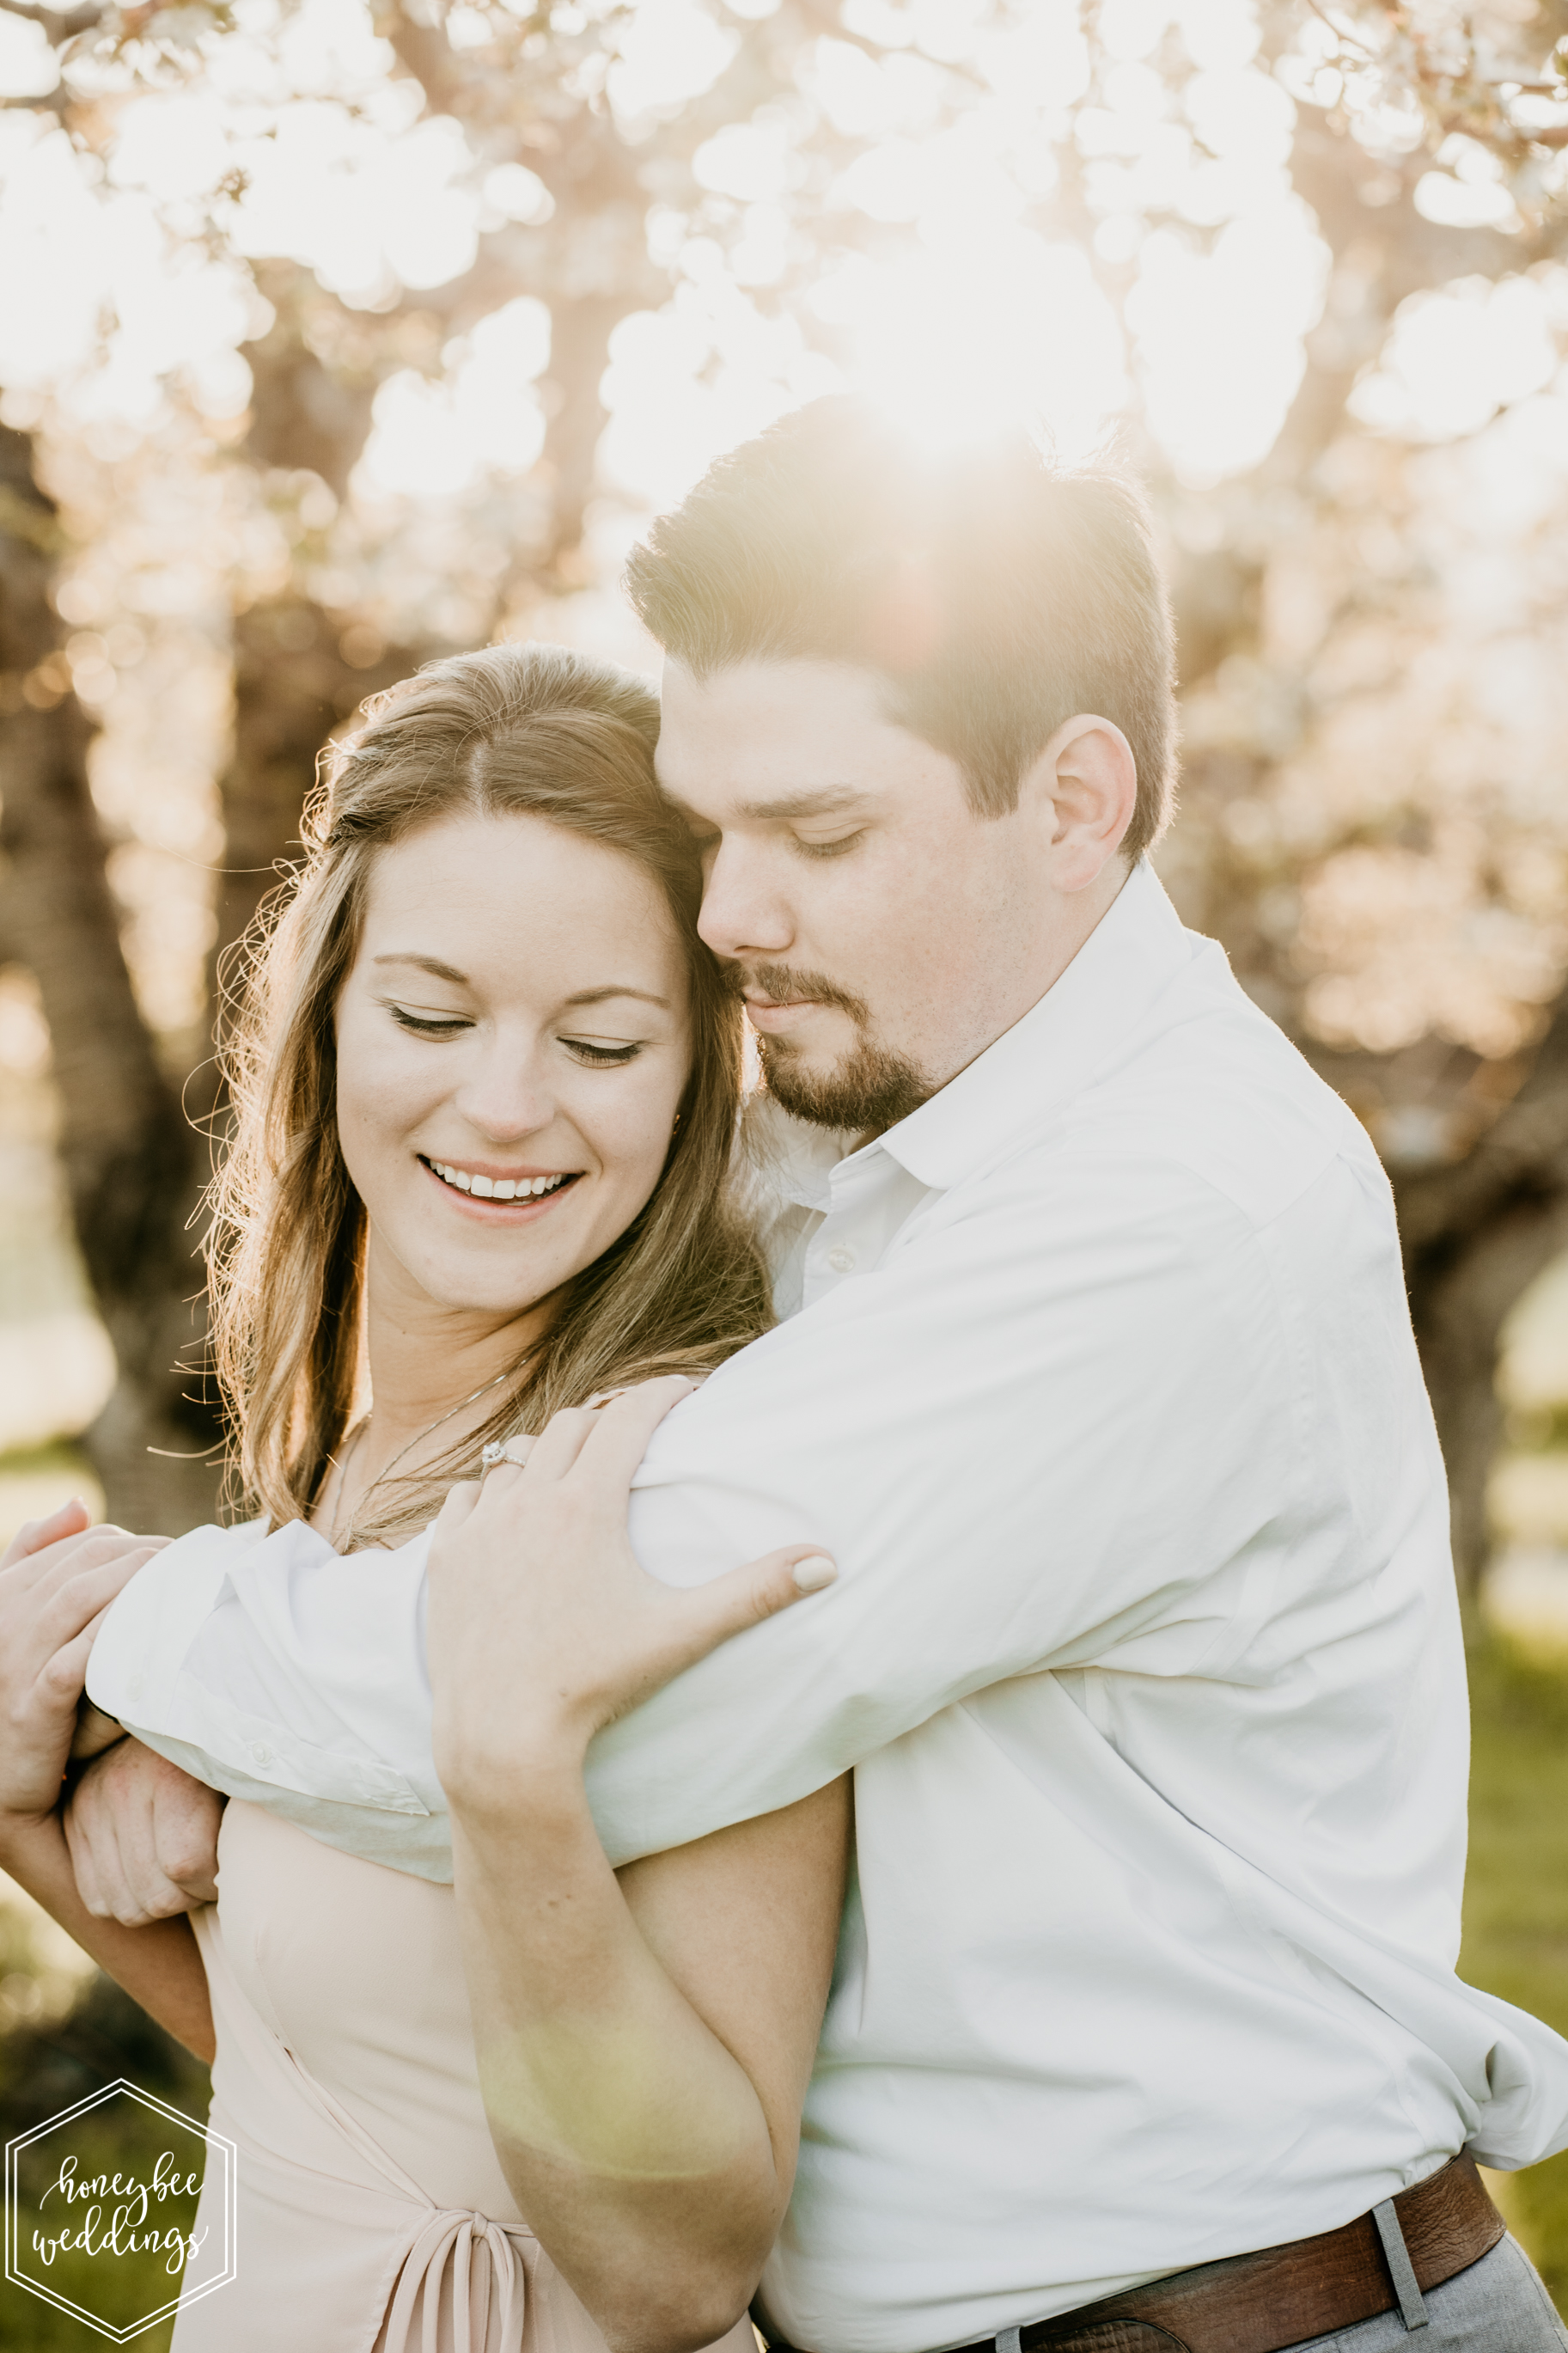 065Montana Wedding Photographer_Cherry Blossom Engagement Session_Ashlin & Luke_Honeybee Weddings_May 11, 2019-194.jpg